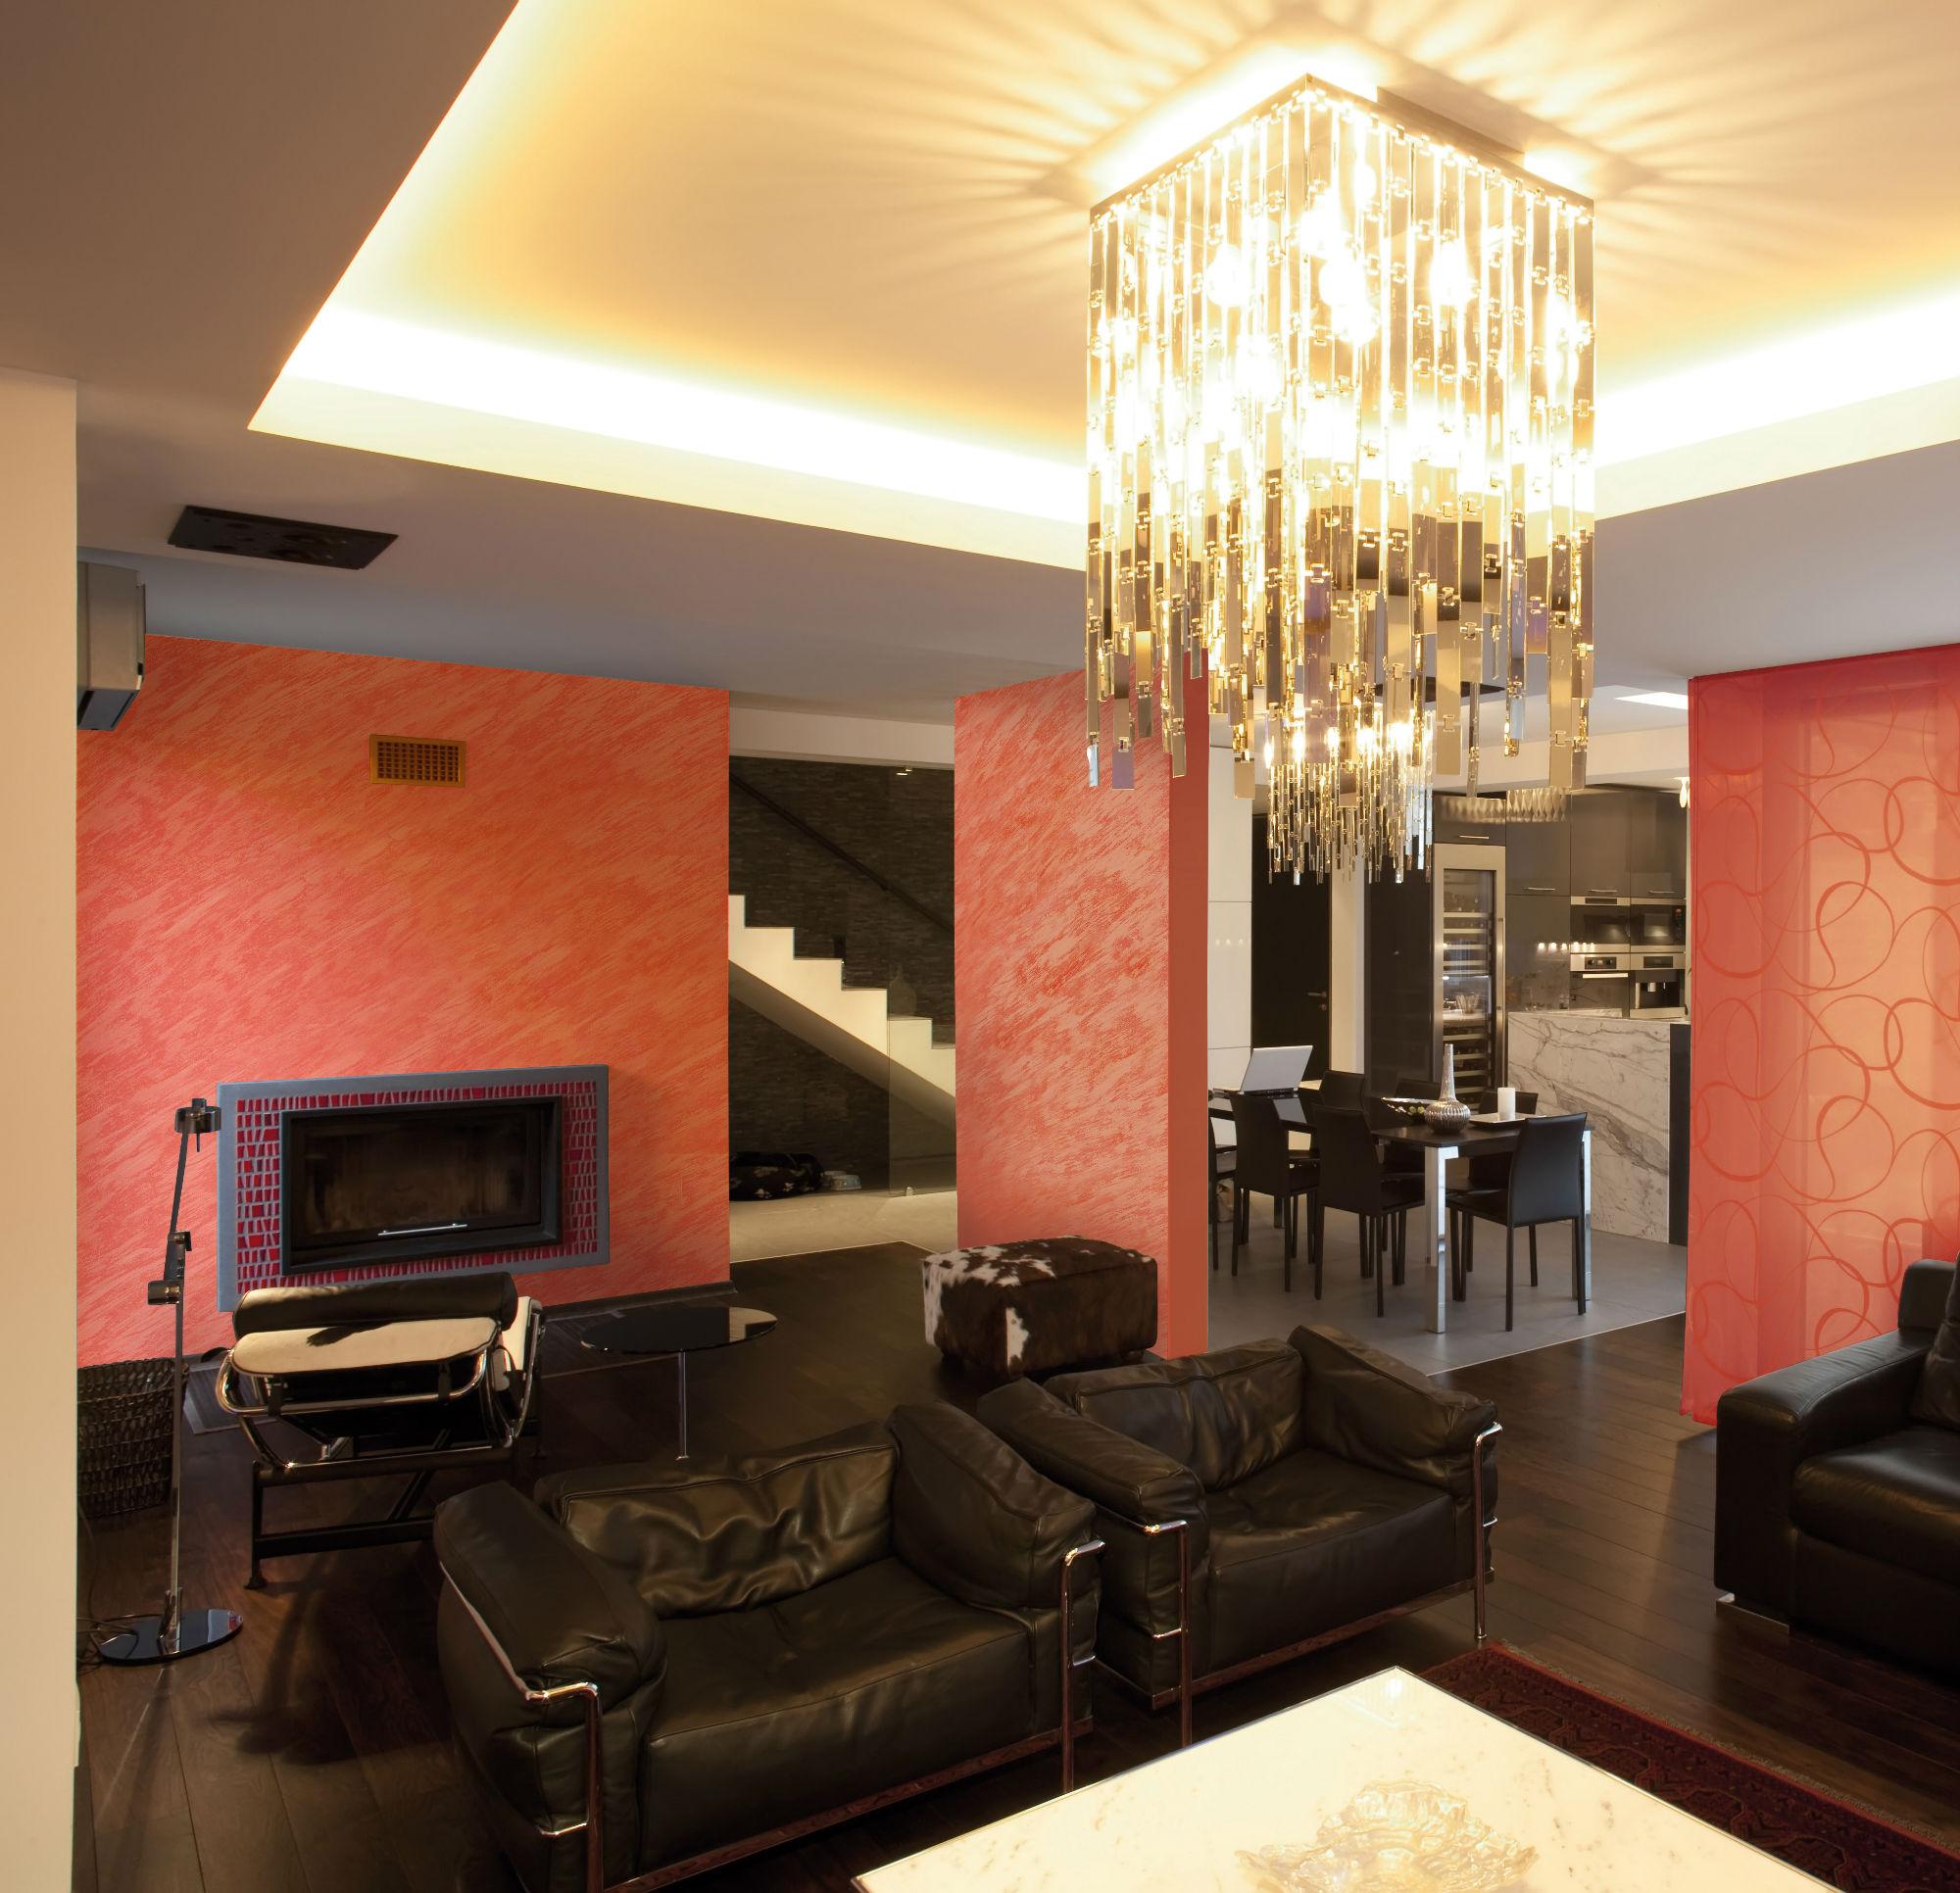 Pitture da interni particolari pittura decorativa per - Pittura sala da pranzo ...